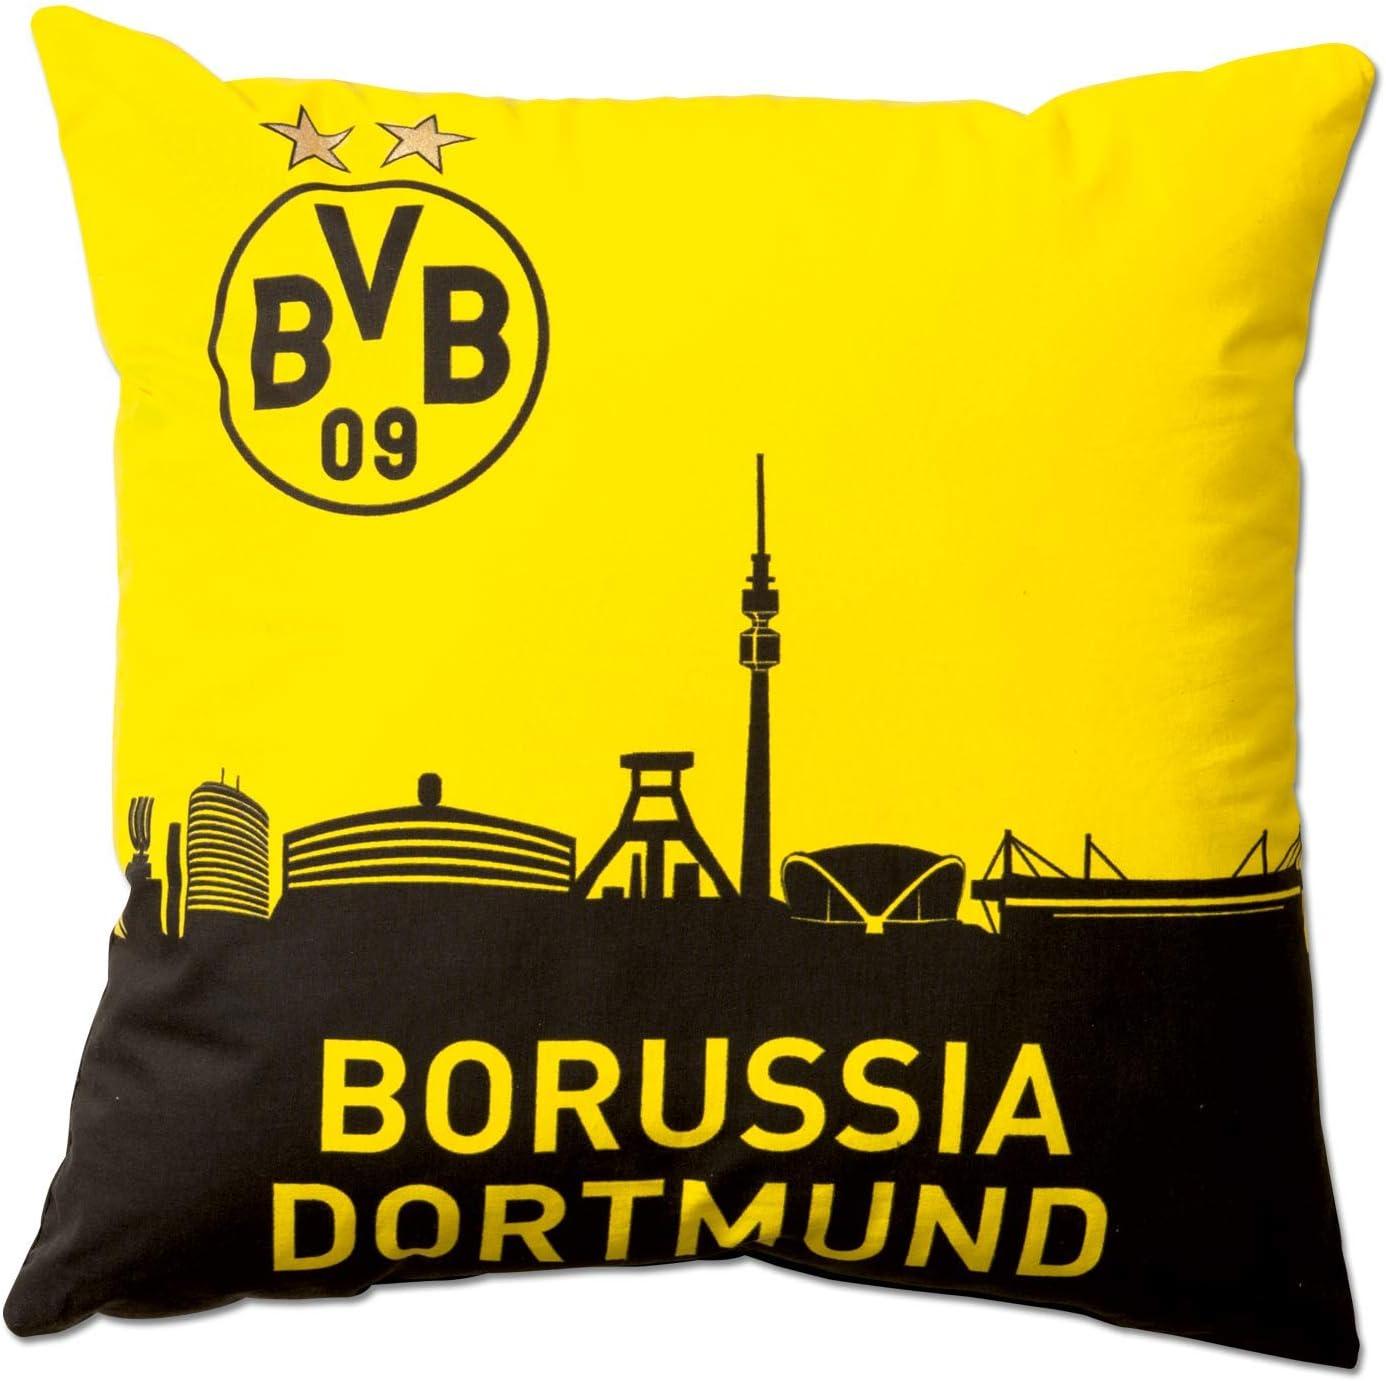 Borussia Dortmund BVB 09 BVB-Kissen mit Skyline 40 x 40cm